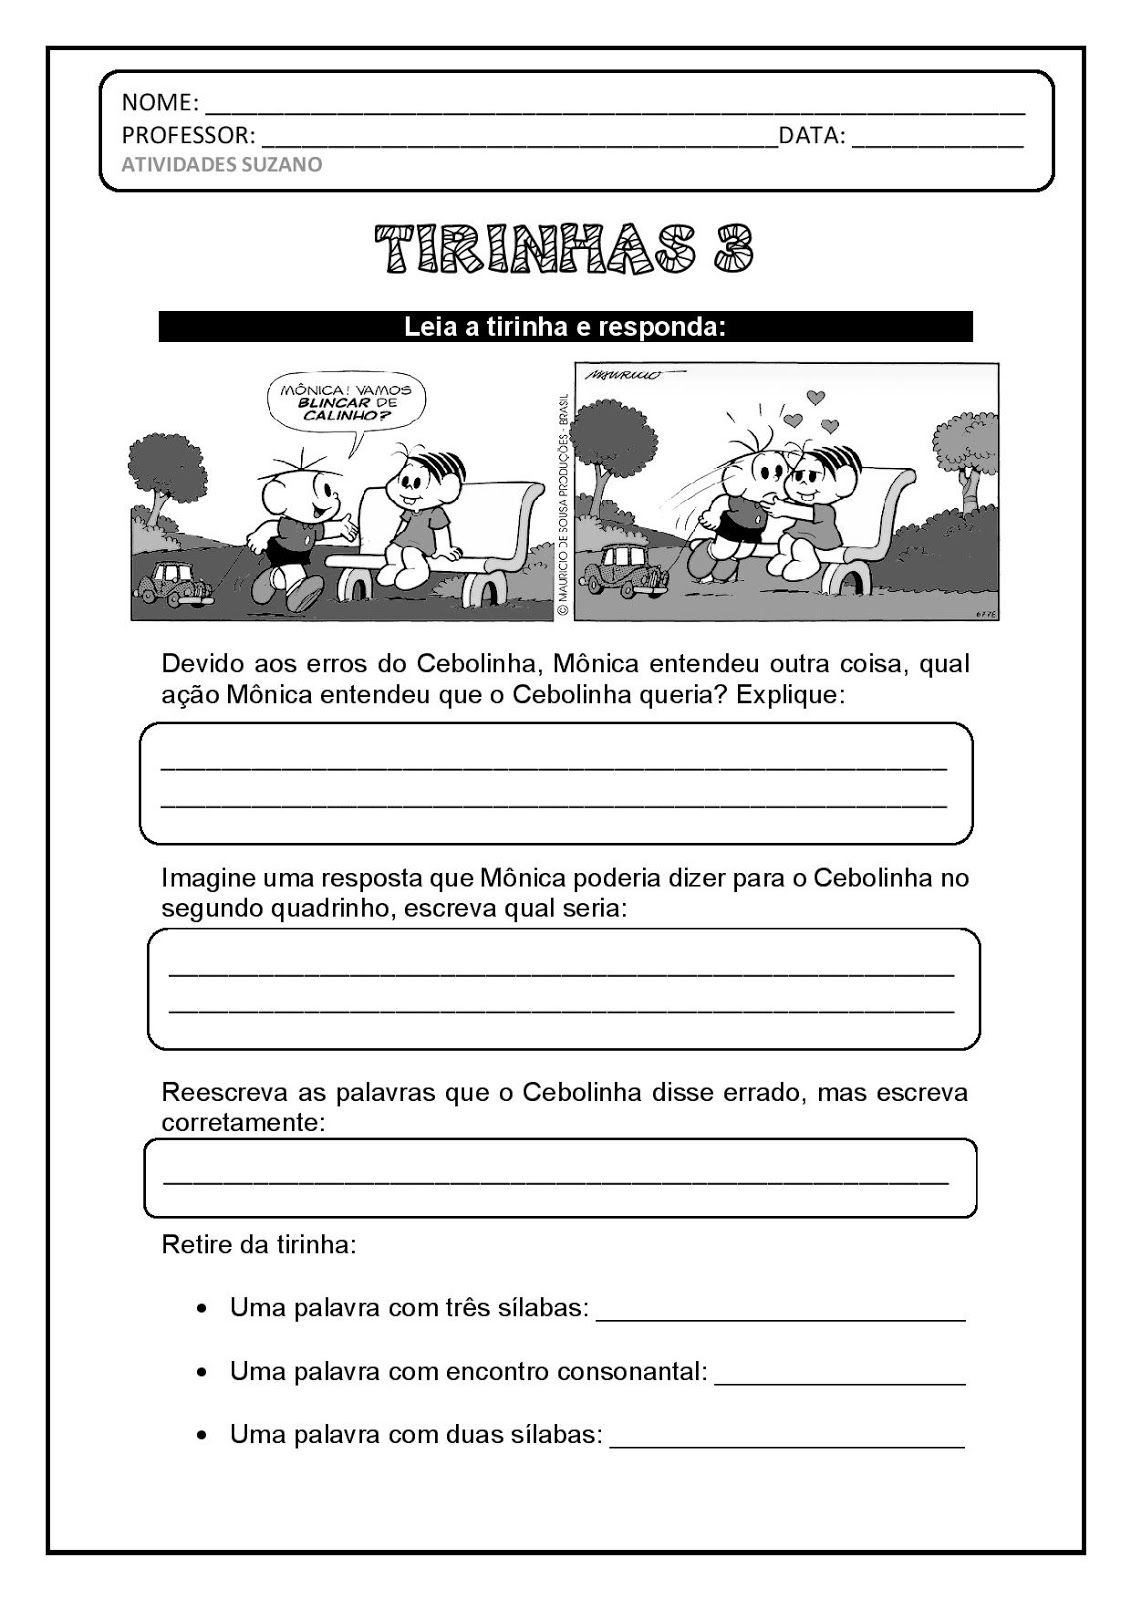 Pin De Jamile Meyre De Oliveira Em Leitura Interp Prod Textual